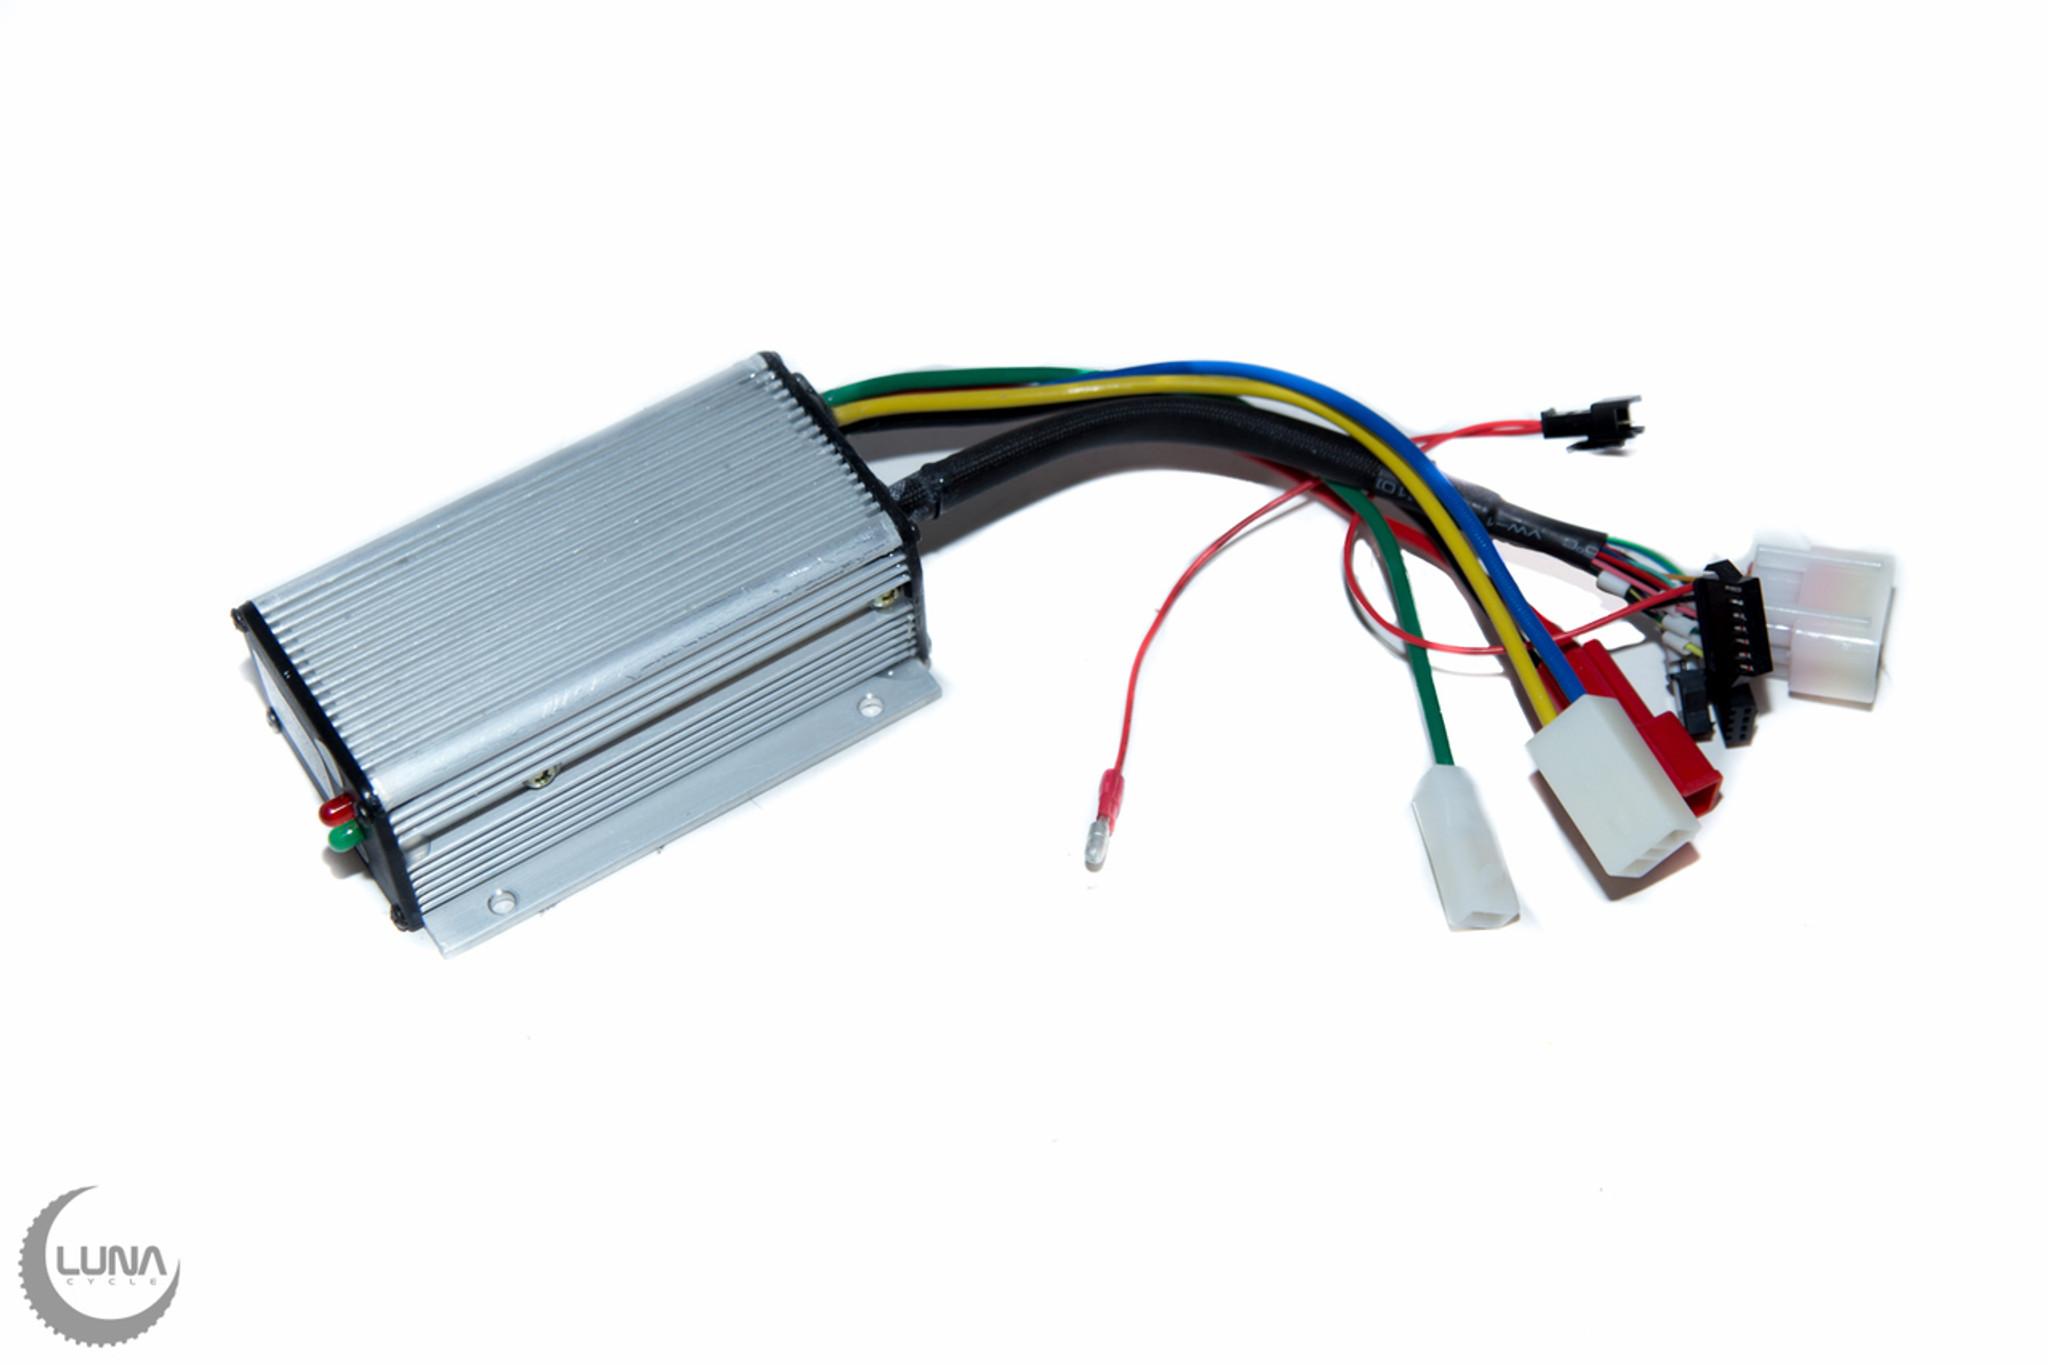 kelly 50amp controller for cyclone 72v luna cycle rh lunacycle com Wiring Diagram Symbols Simple Wiring Diagrams